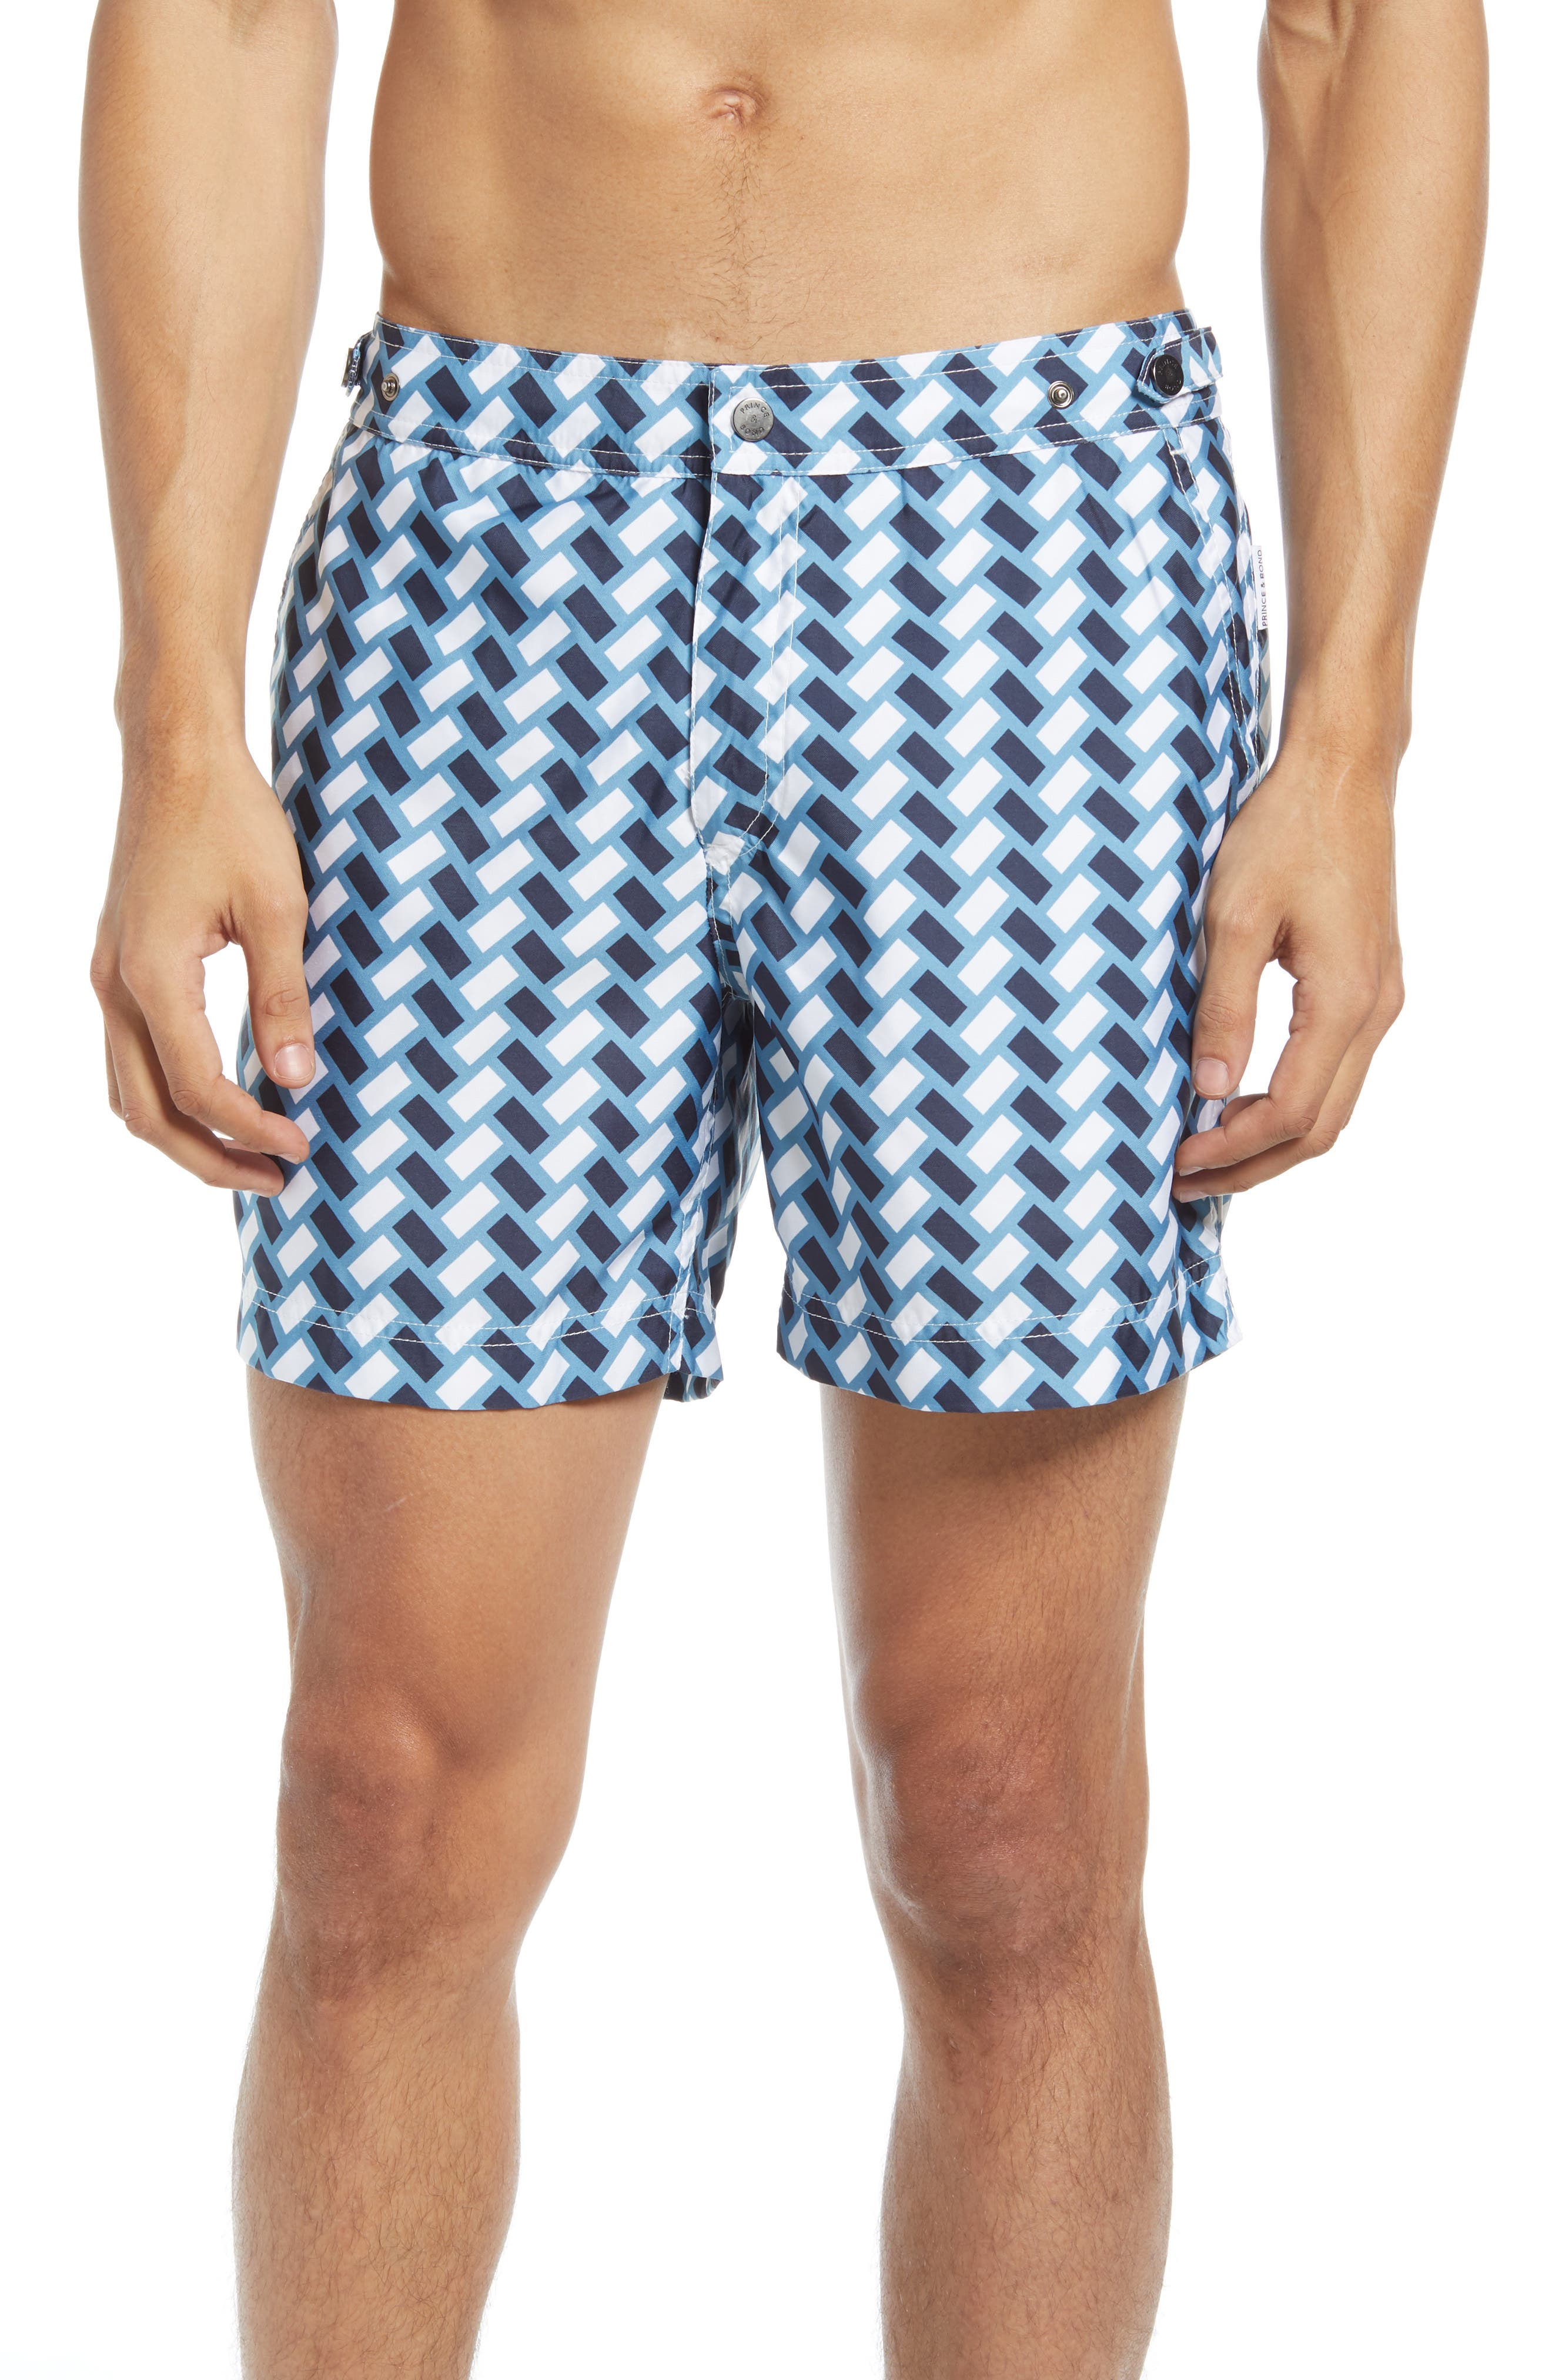 Vintage Men's Swimsuits – 1930s, 1940s, 1950s History Mens Prince  Bond Retro Tile Print Hybrid Nylon Swim Trunks Size 36 - Blue $175.00 AT vintagedancer.com